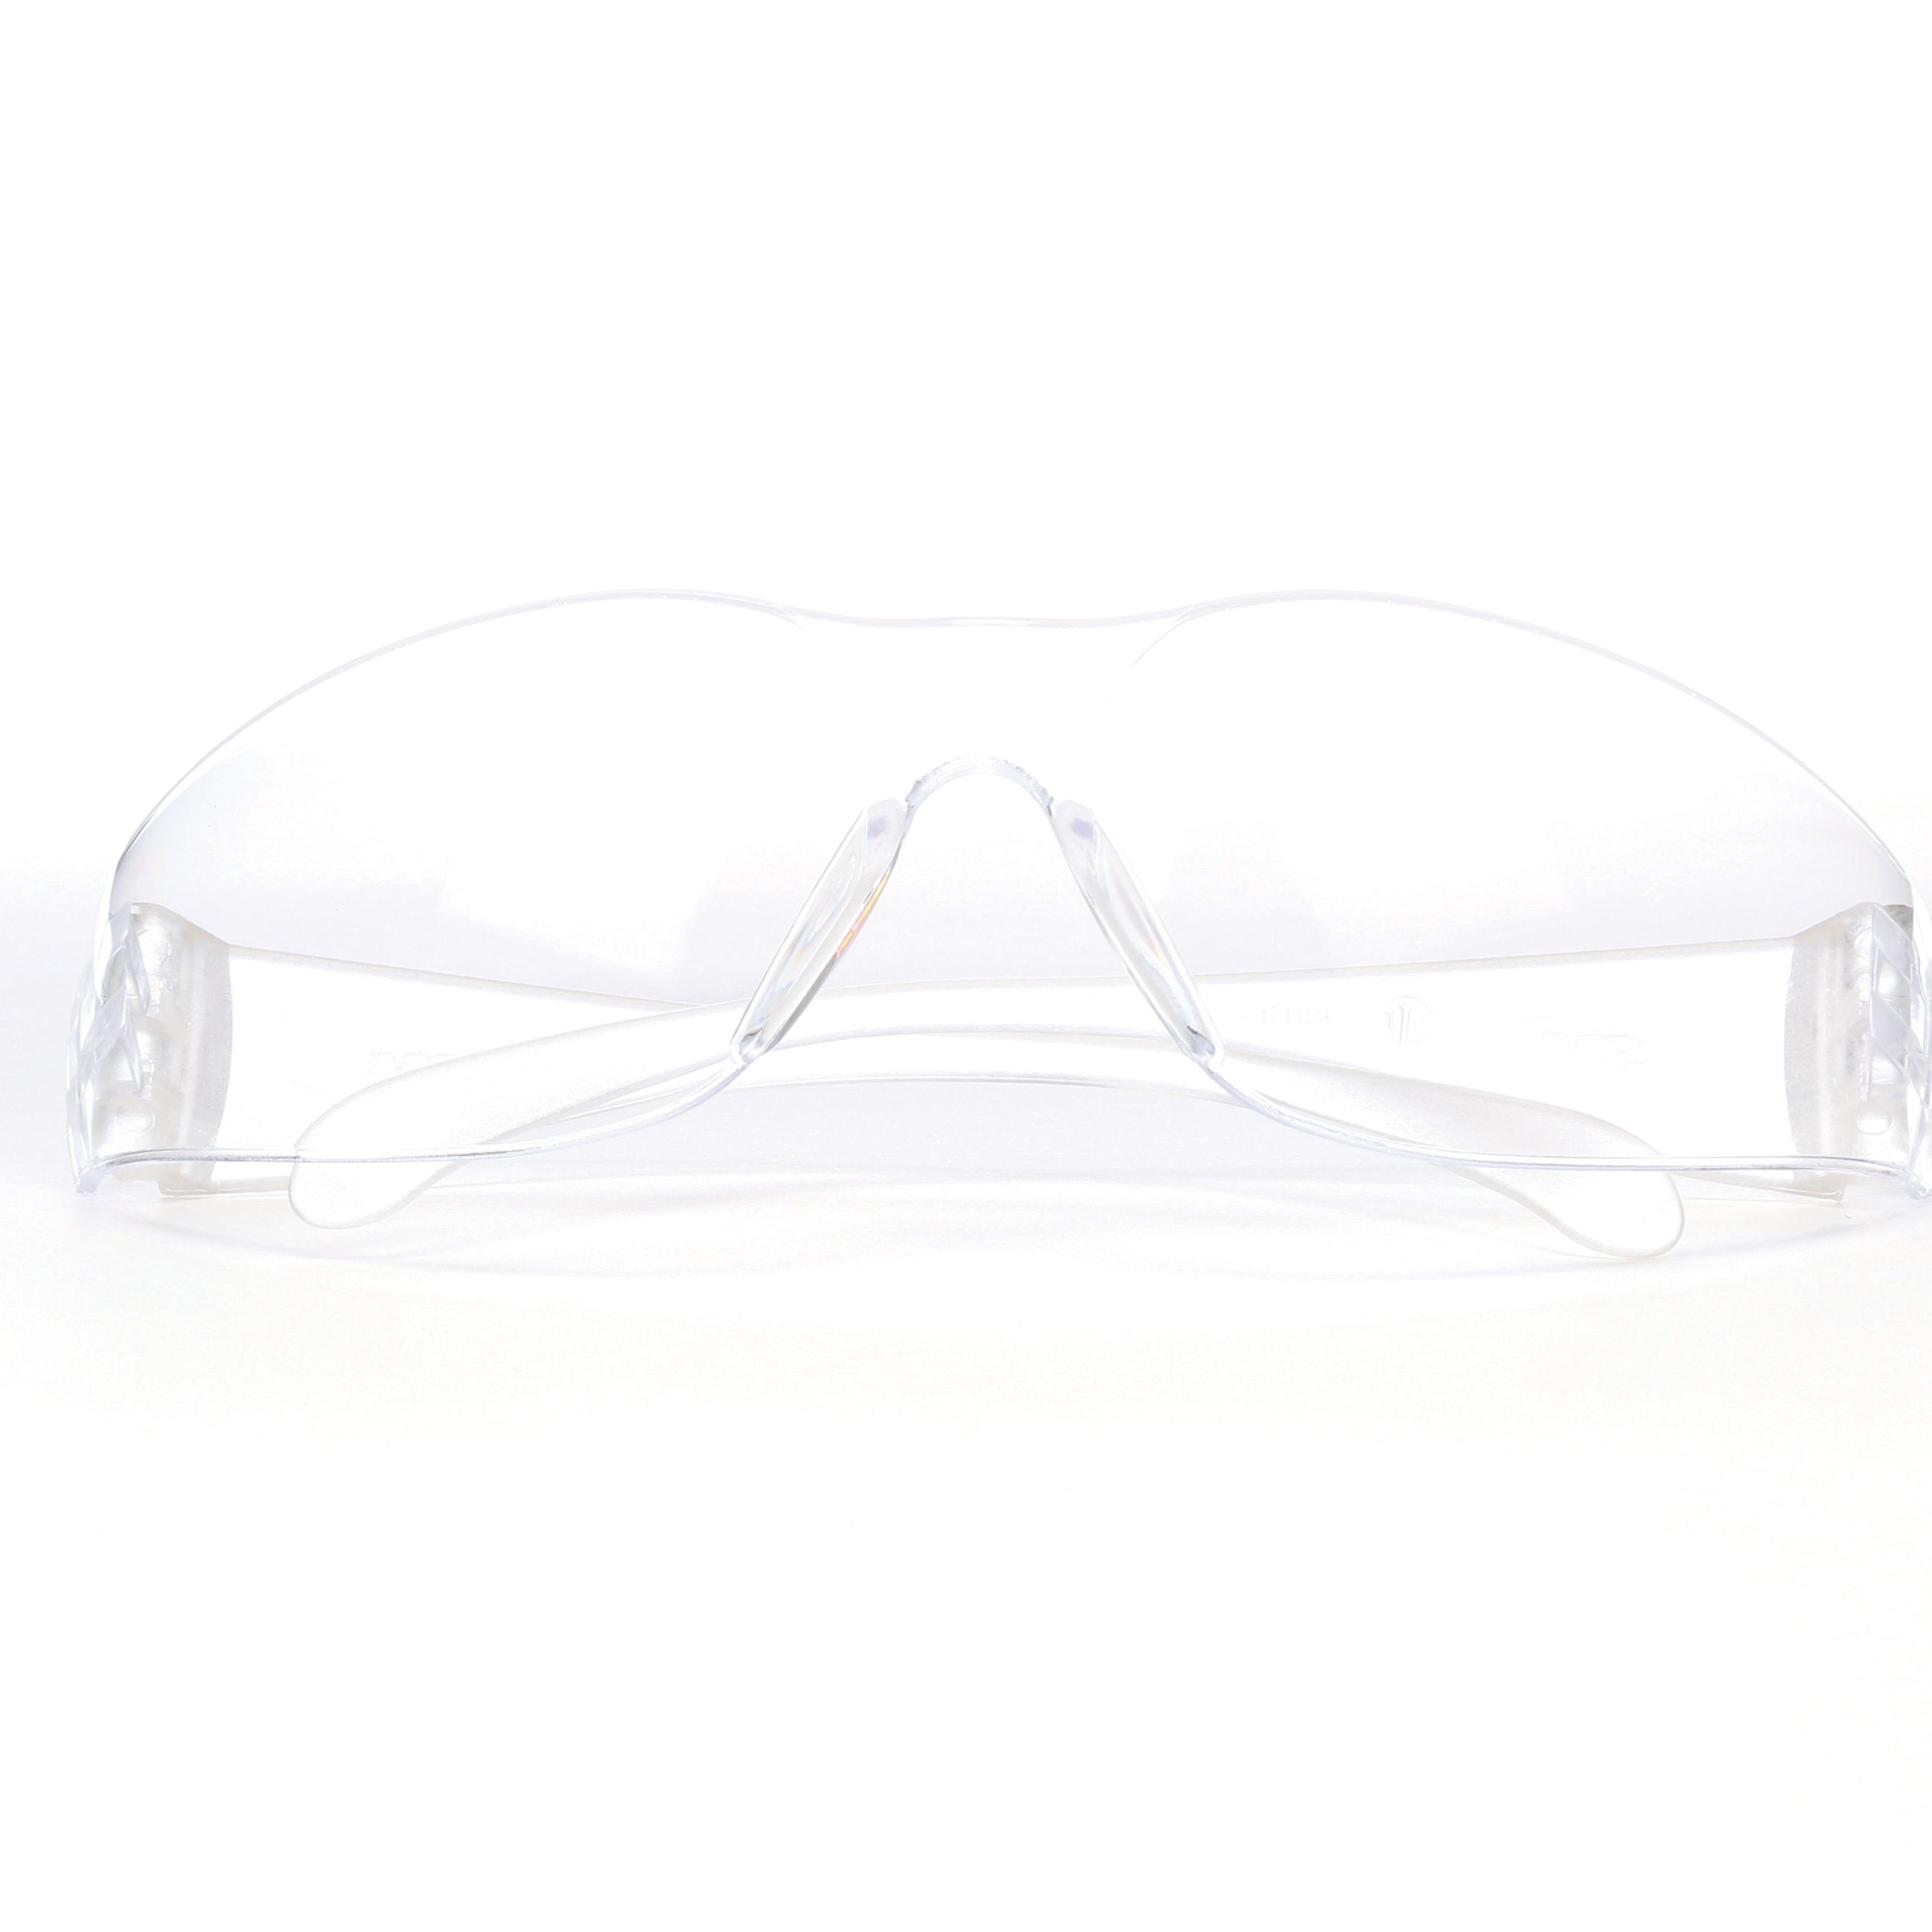 3M™ Virtua™ 078371-62099 Economy Lightweight Protective Eyewear, Anti-Scratch/Hard Coat, Clear Lens, Frameless/Wrap Around Frame, Clear, Polycarbonate Frame, Polycarbonate Lens, ANSI Z87.1-2015